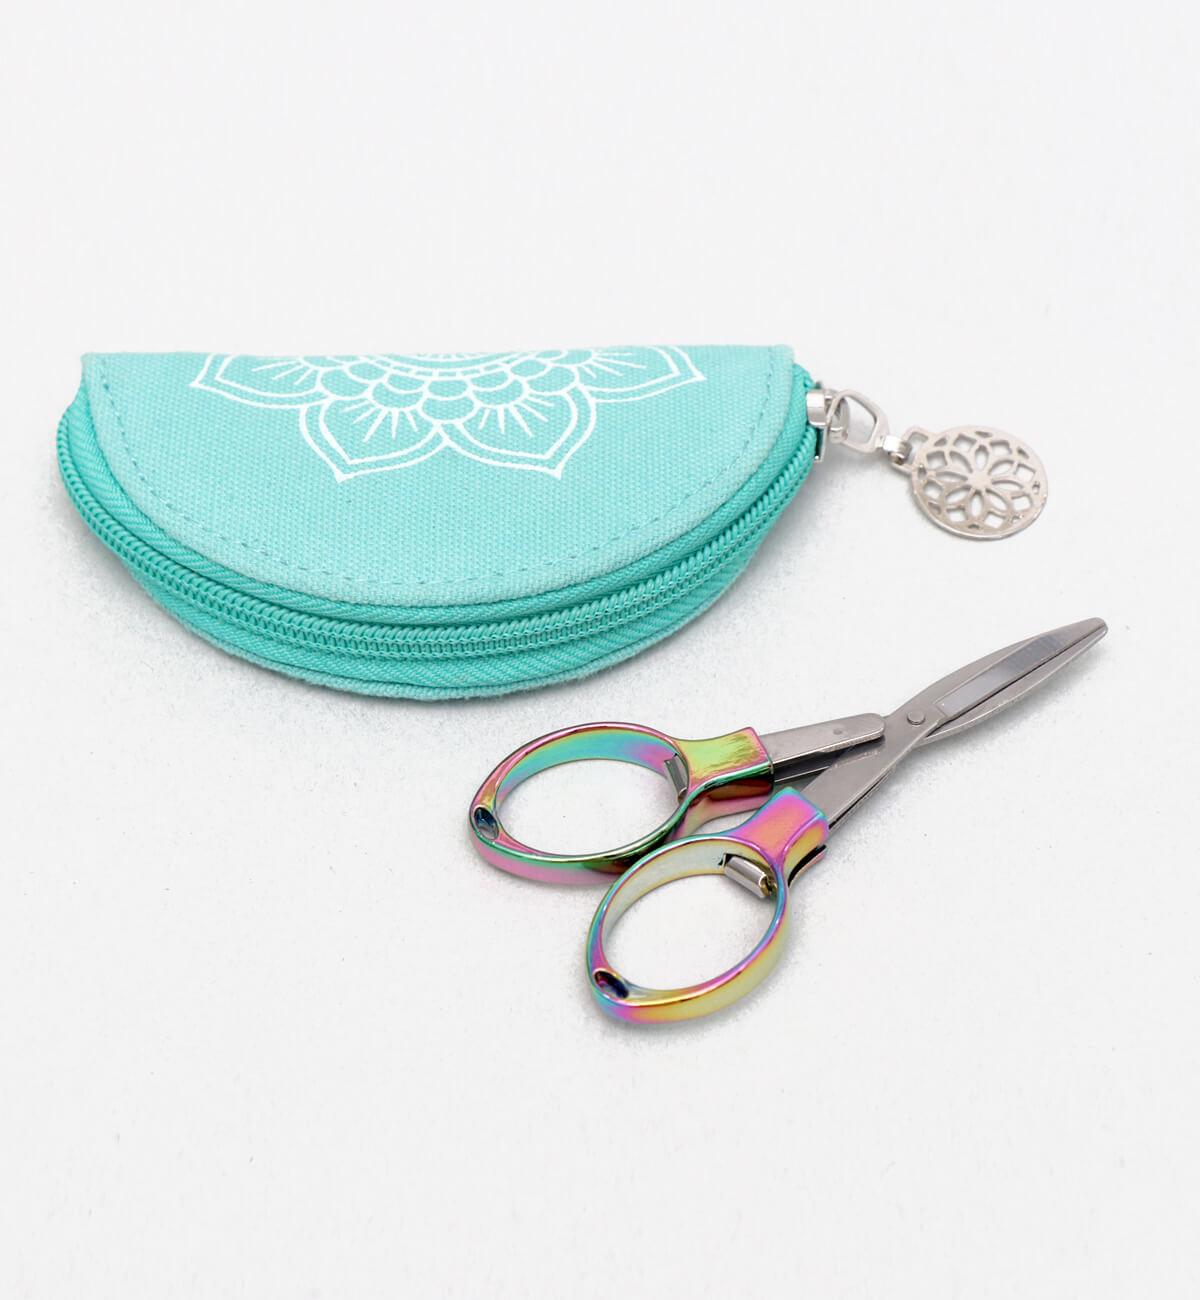 Knitters Pride KP Mindful Folding Scissors